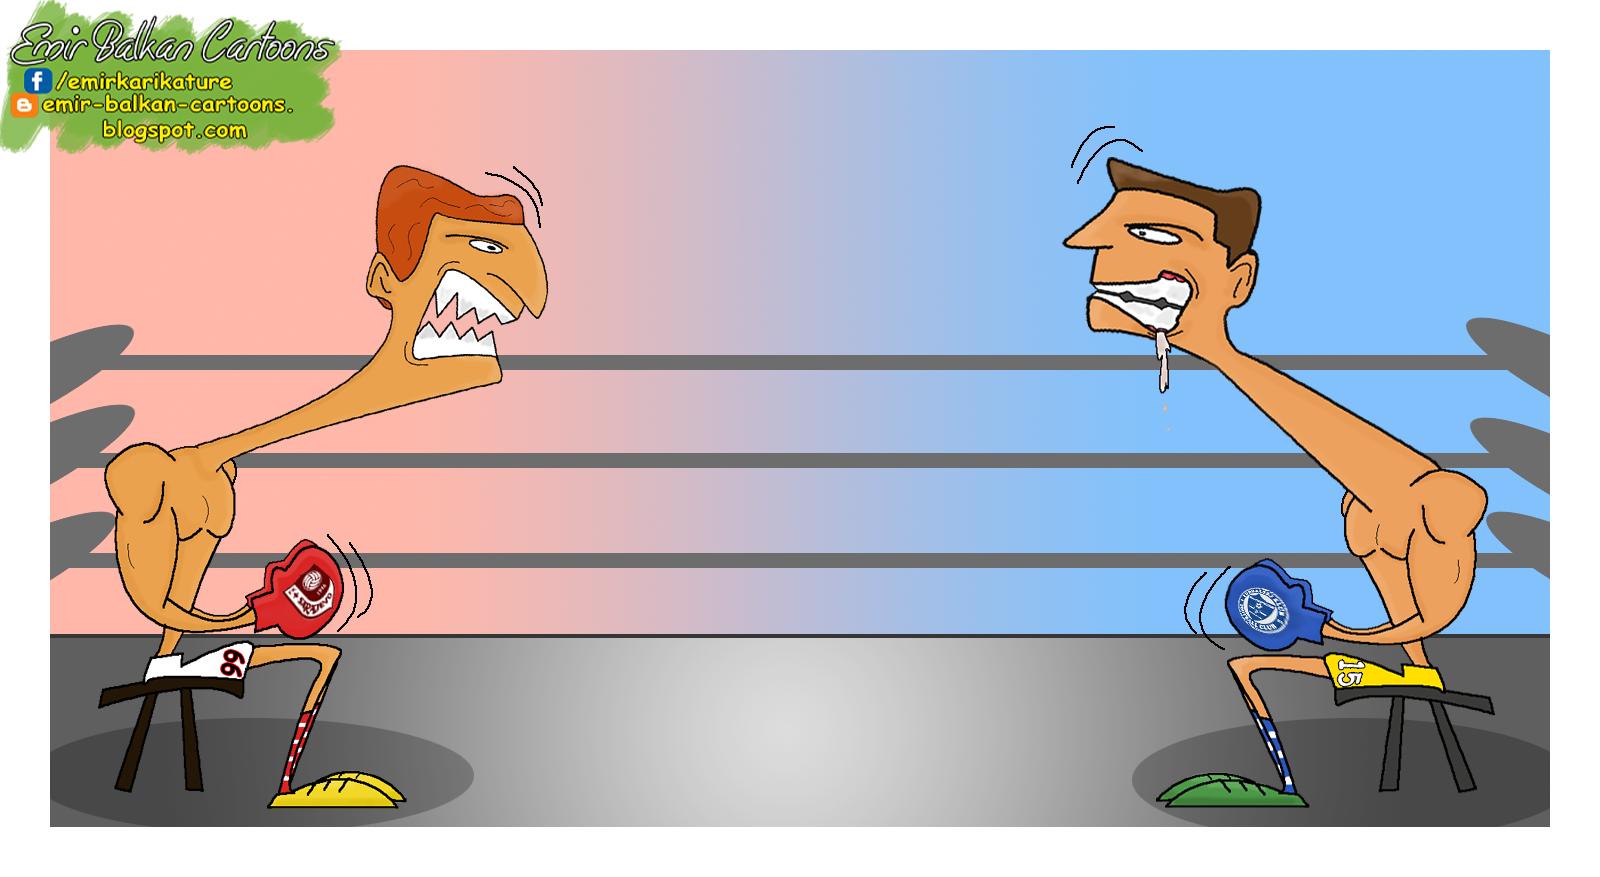 http://emir-balkan-cartoons.blogspot.com/2014/03/da-li-ste-spremni-za-vjeciti-derbi.html